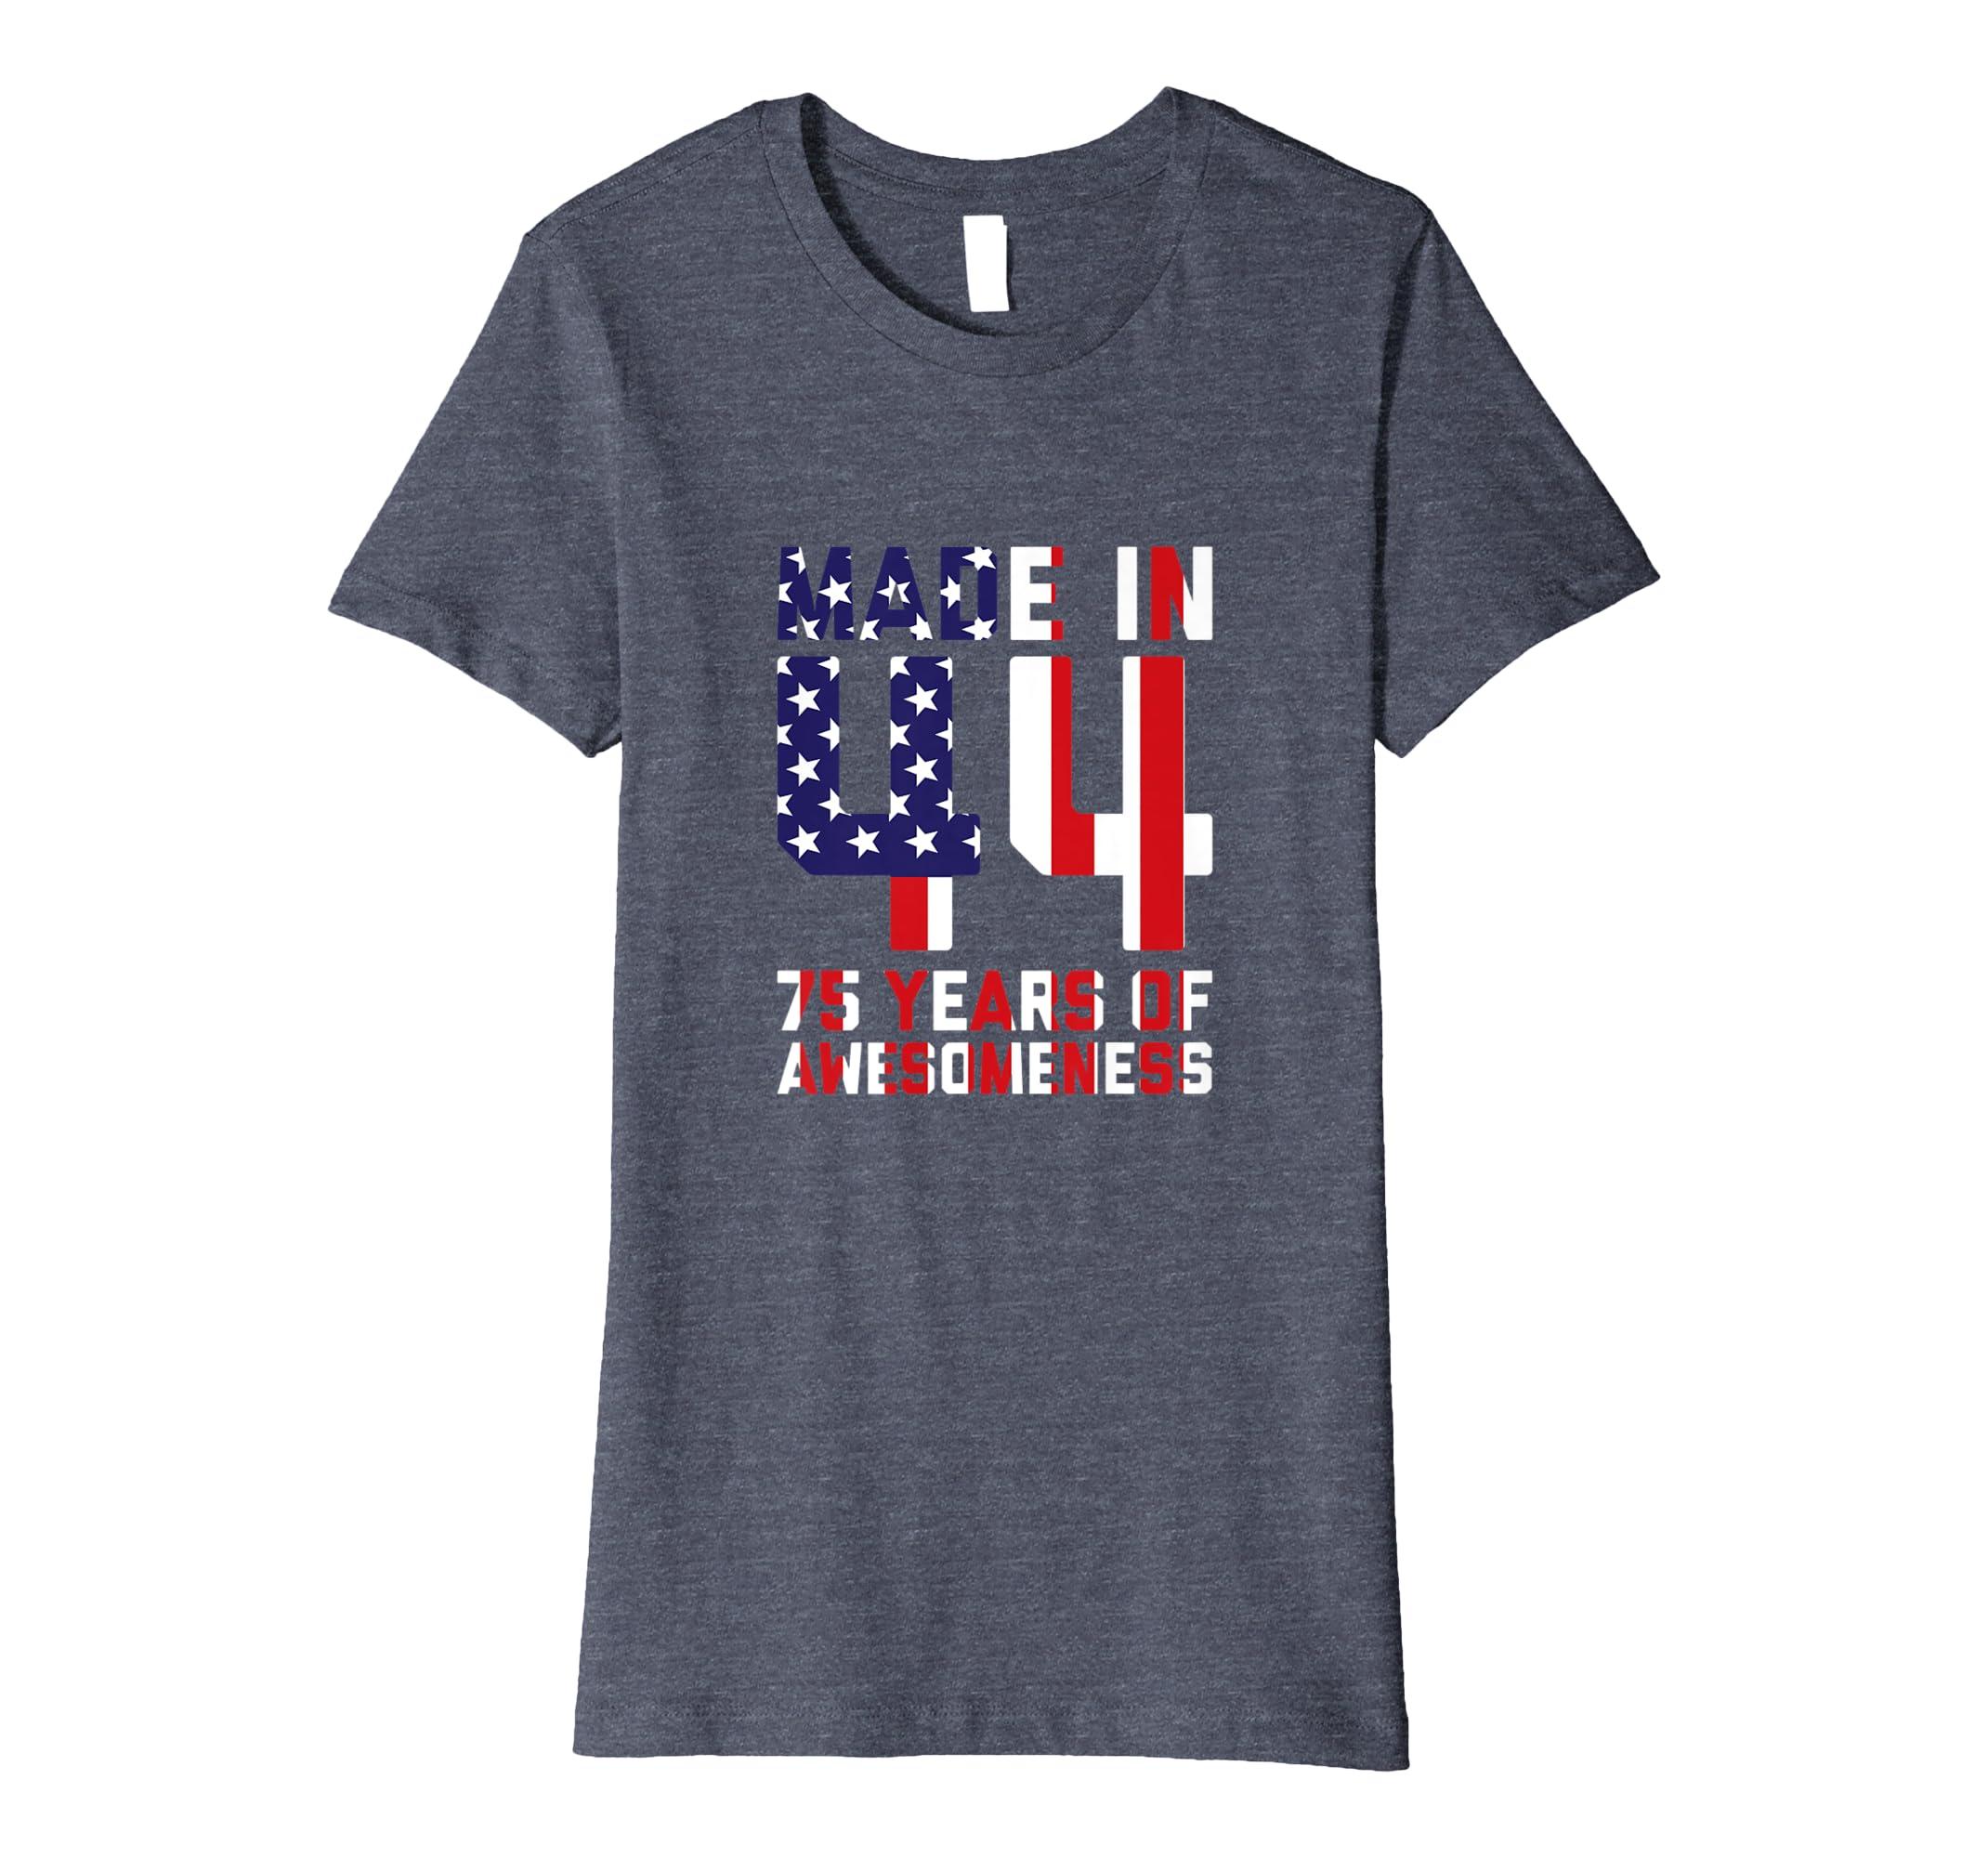 Amazon 75th Birthday Tshirt For Men Gifts 75 Year Old Grandpa Dad Clothing